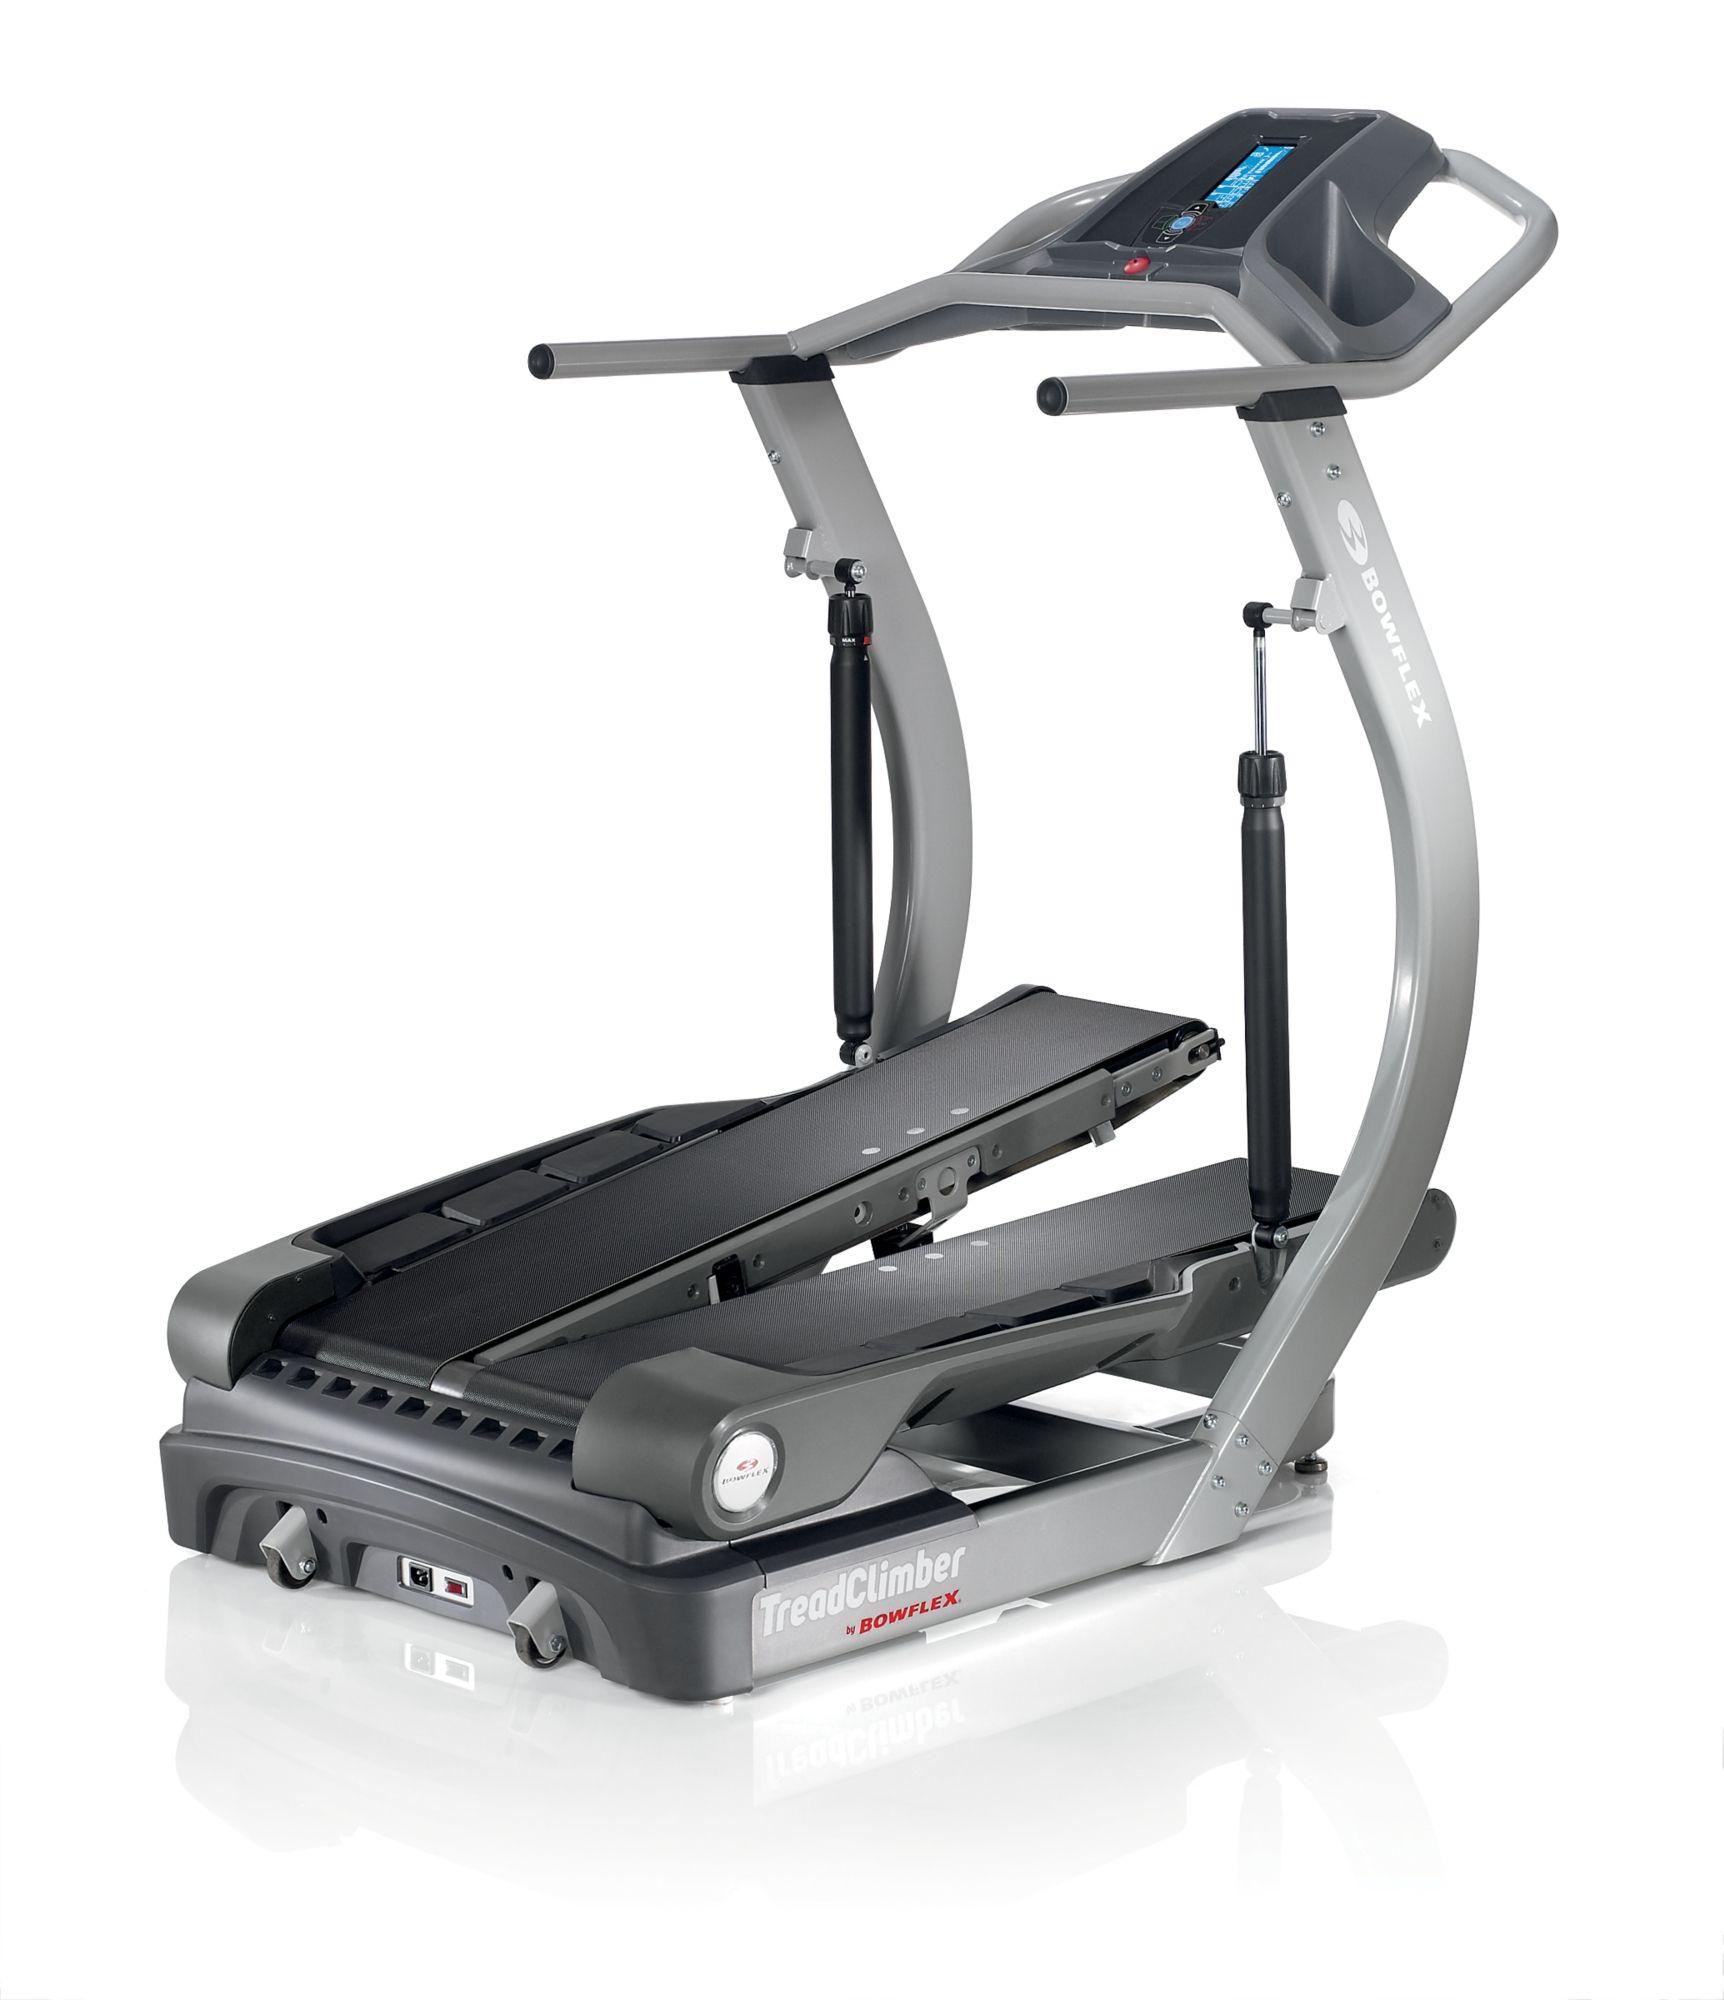 Bowflex Treadclimber Benefits: Walk At Home With A Bowflex TreadClimber TC20, Which